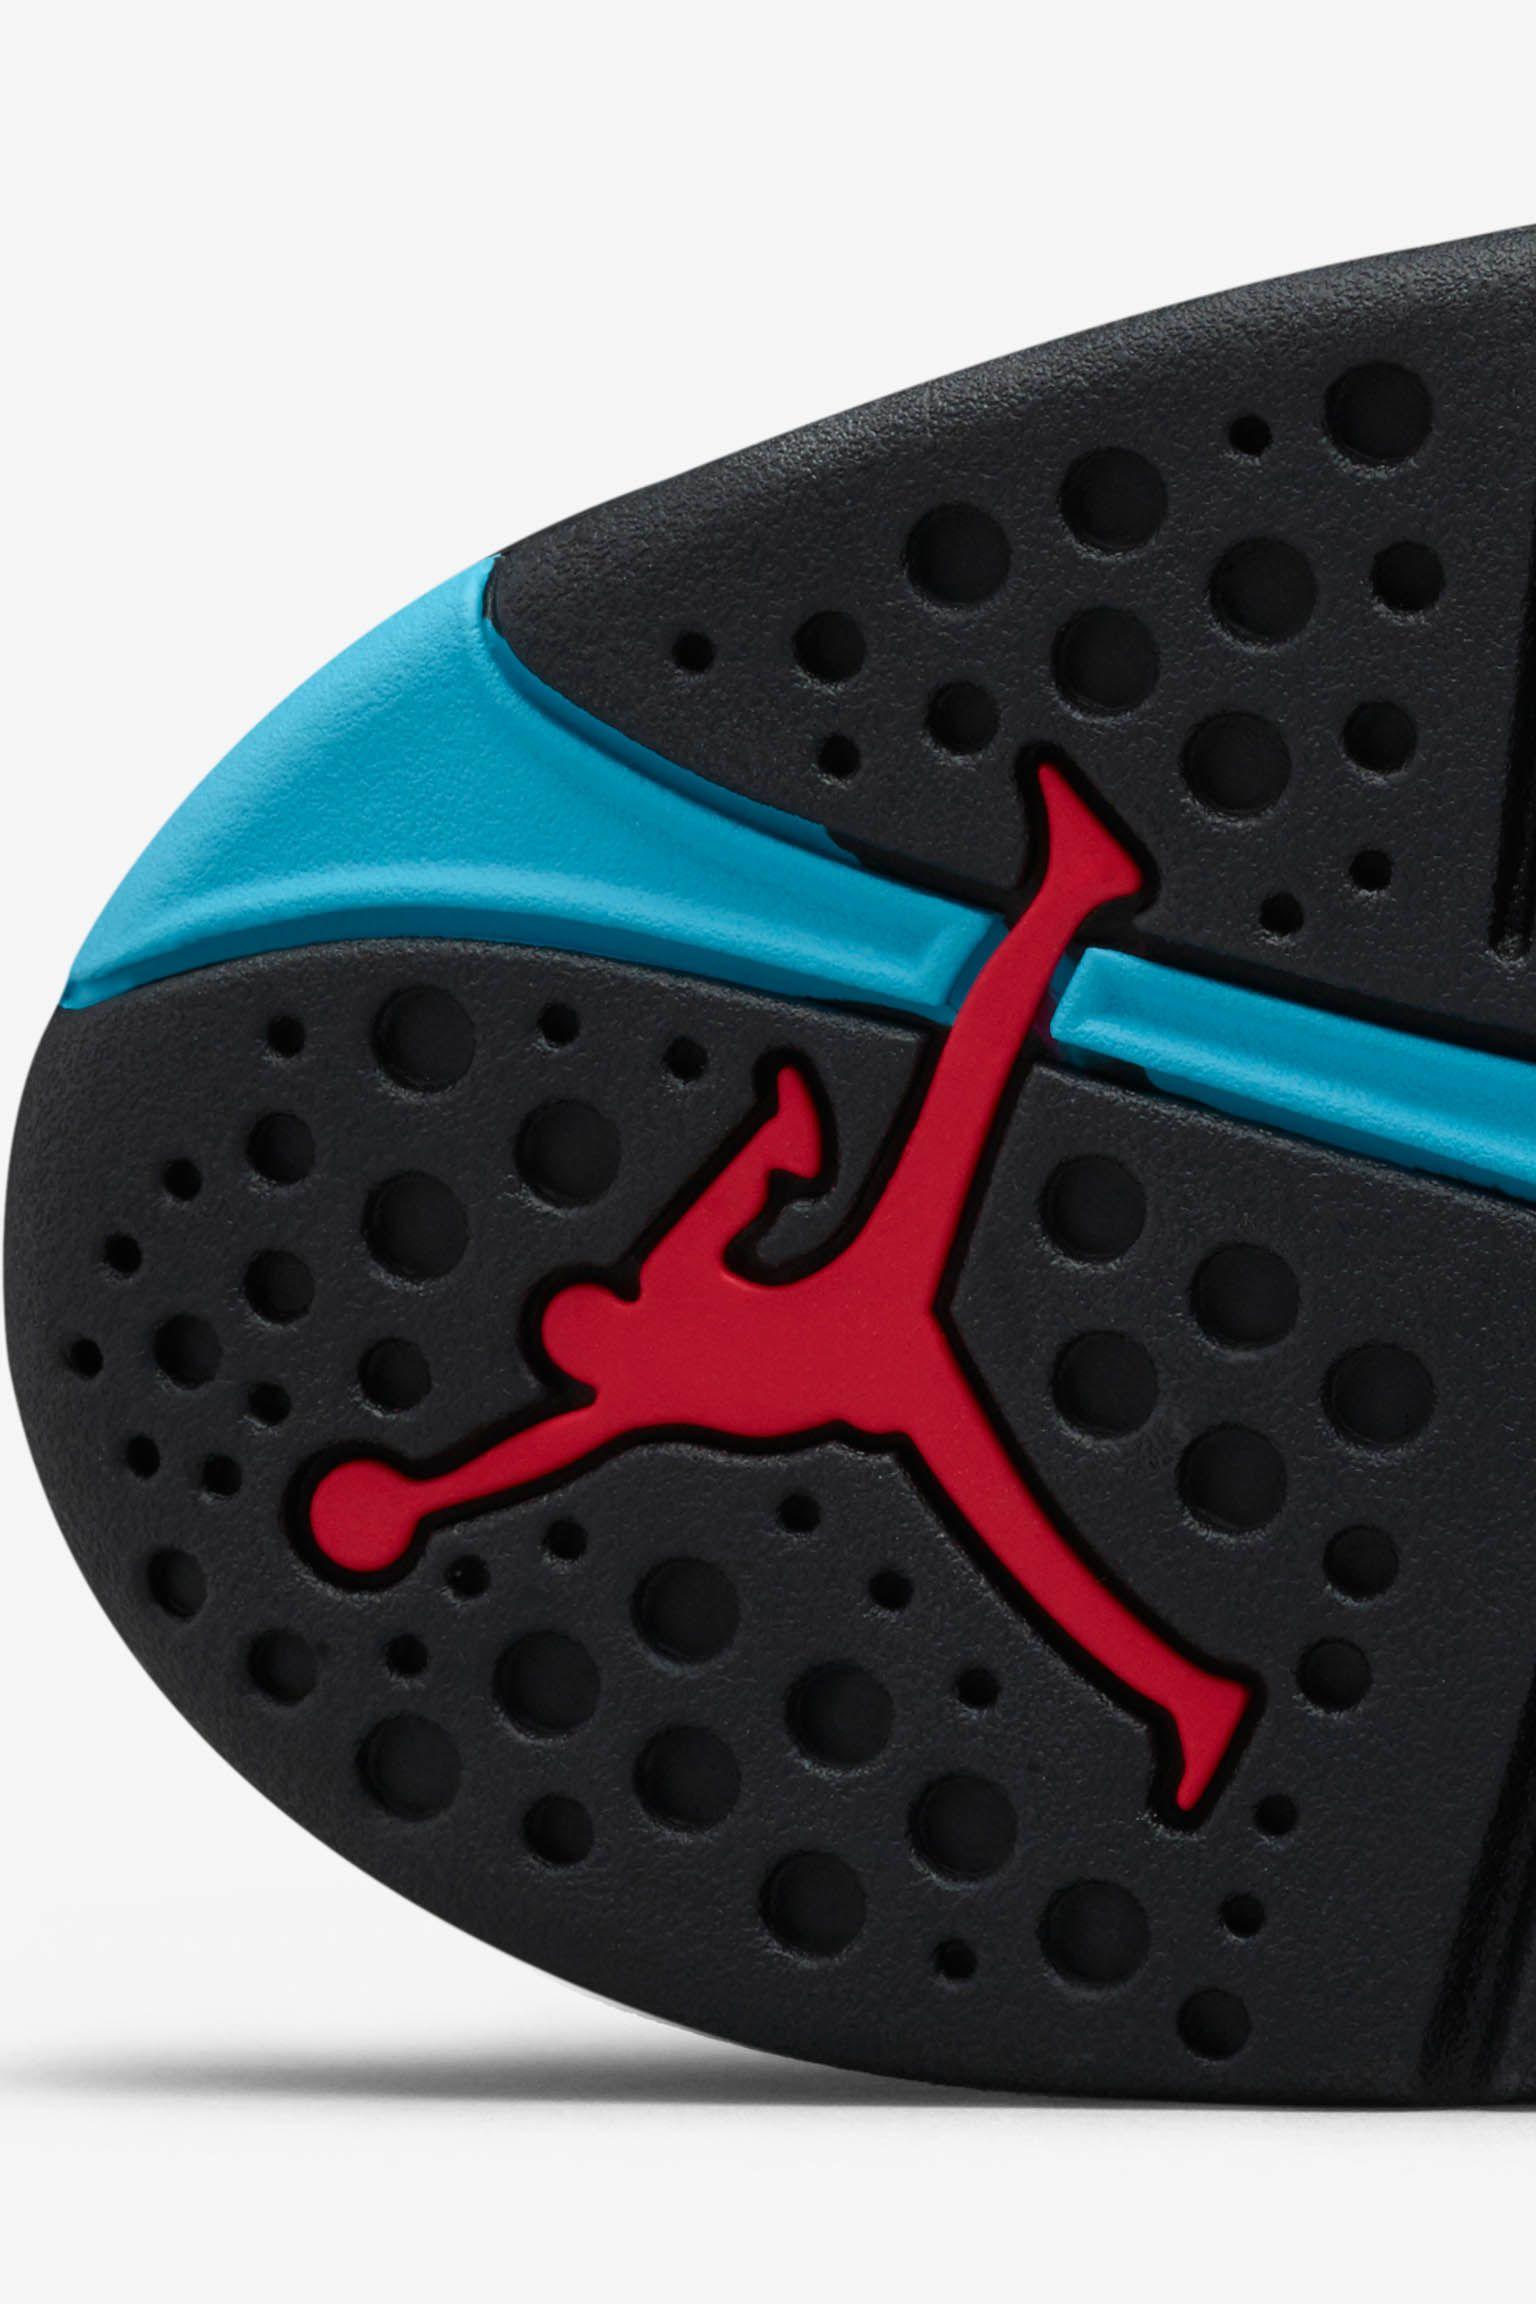 Air Jordan 8 Retro 'Aqua' Release Date